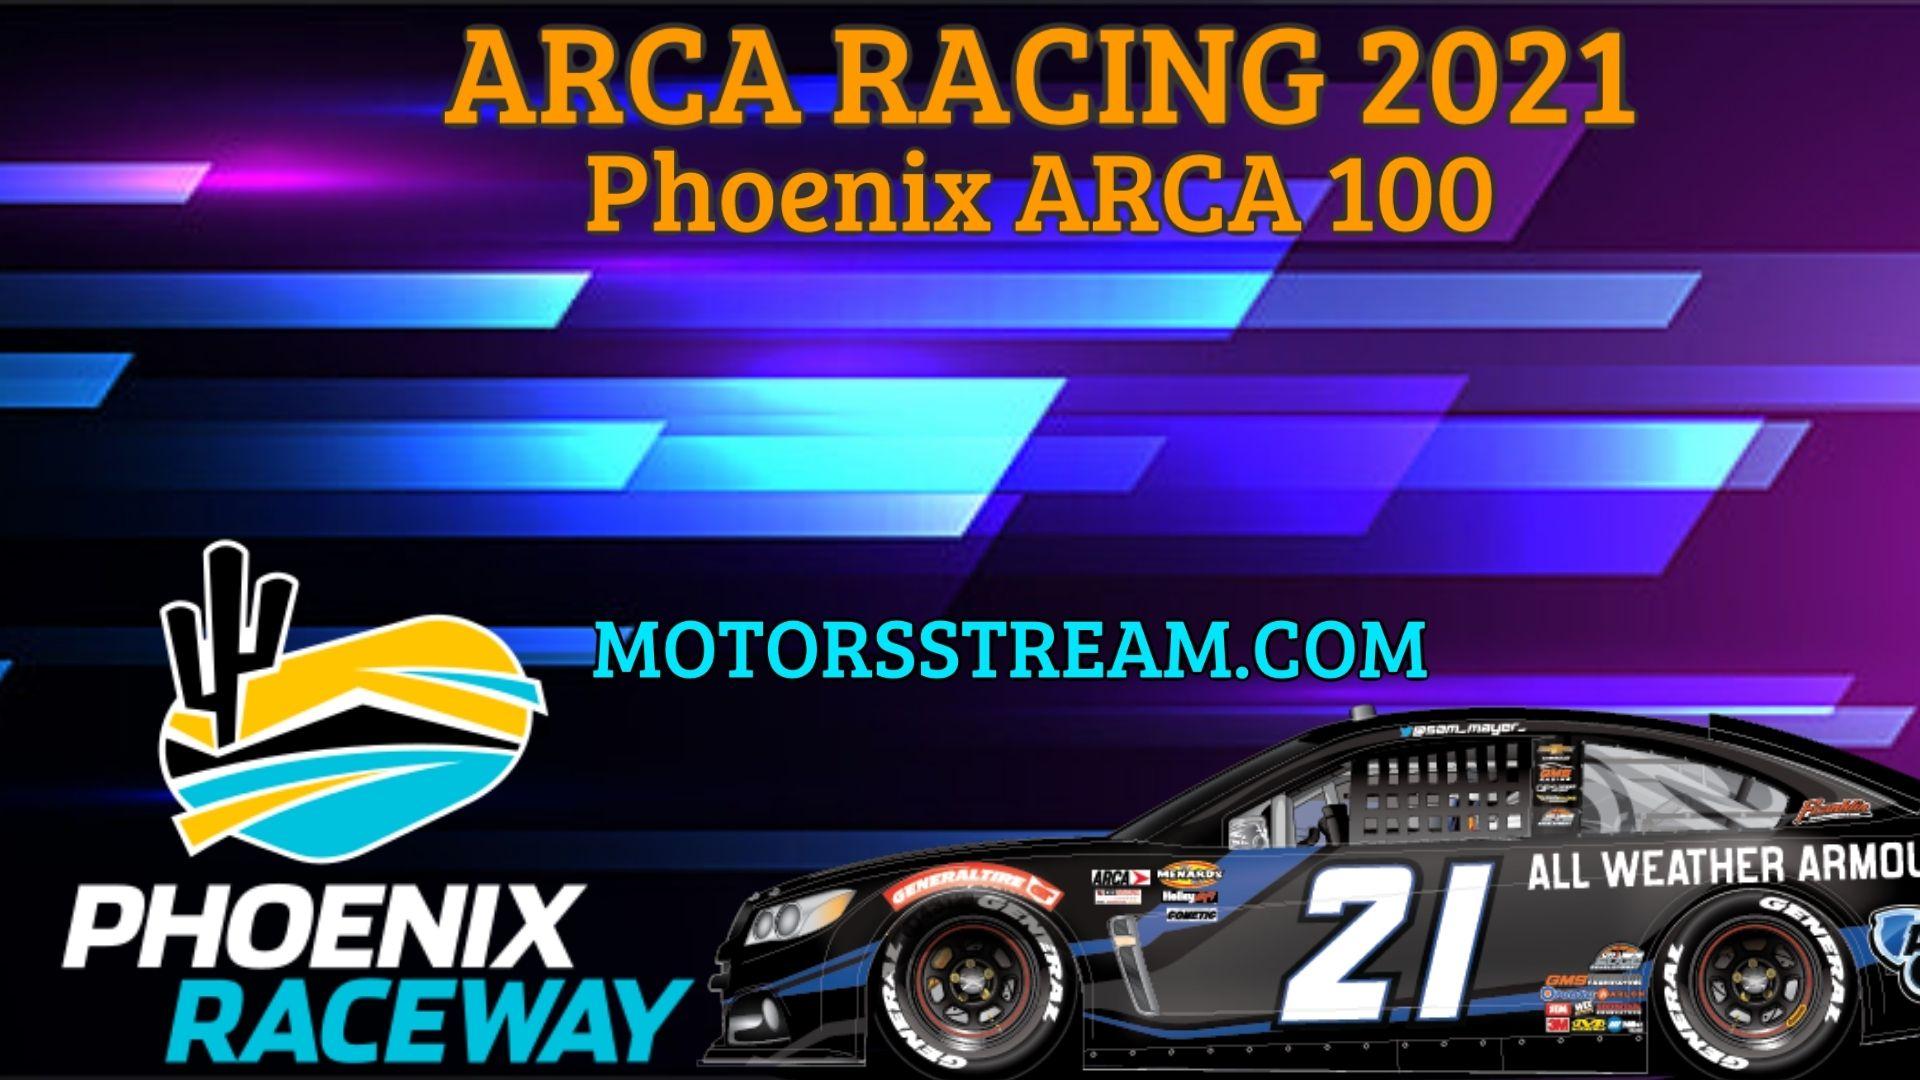 Phoenix ARCA 100 Live Stream 2021 Arca Racing